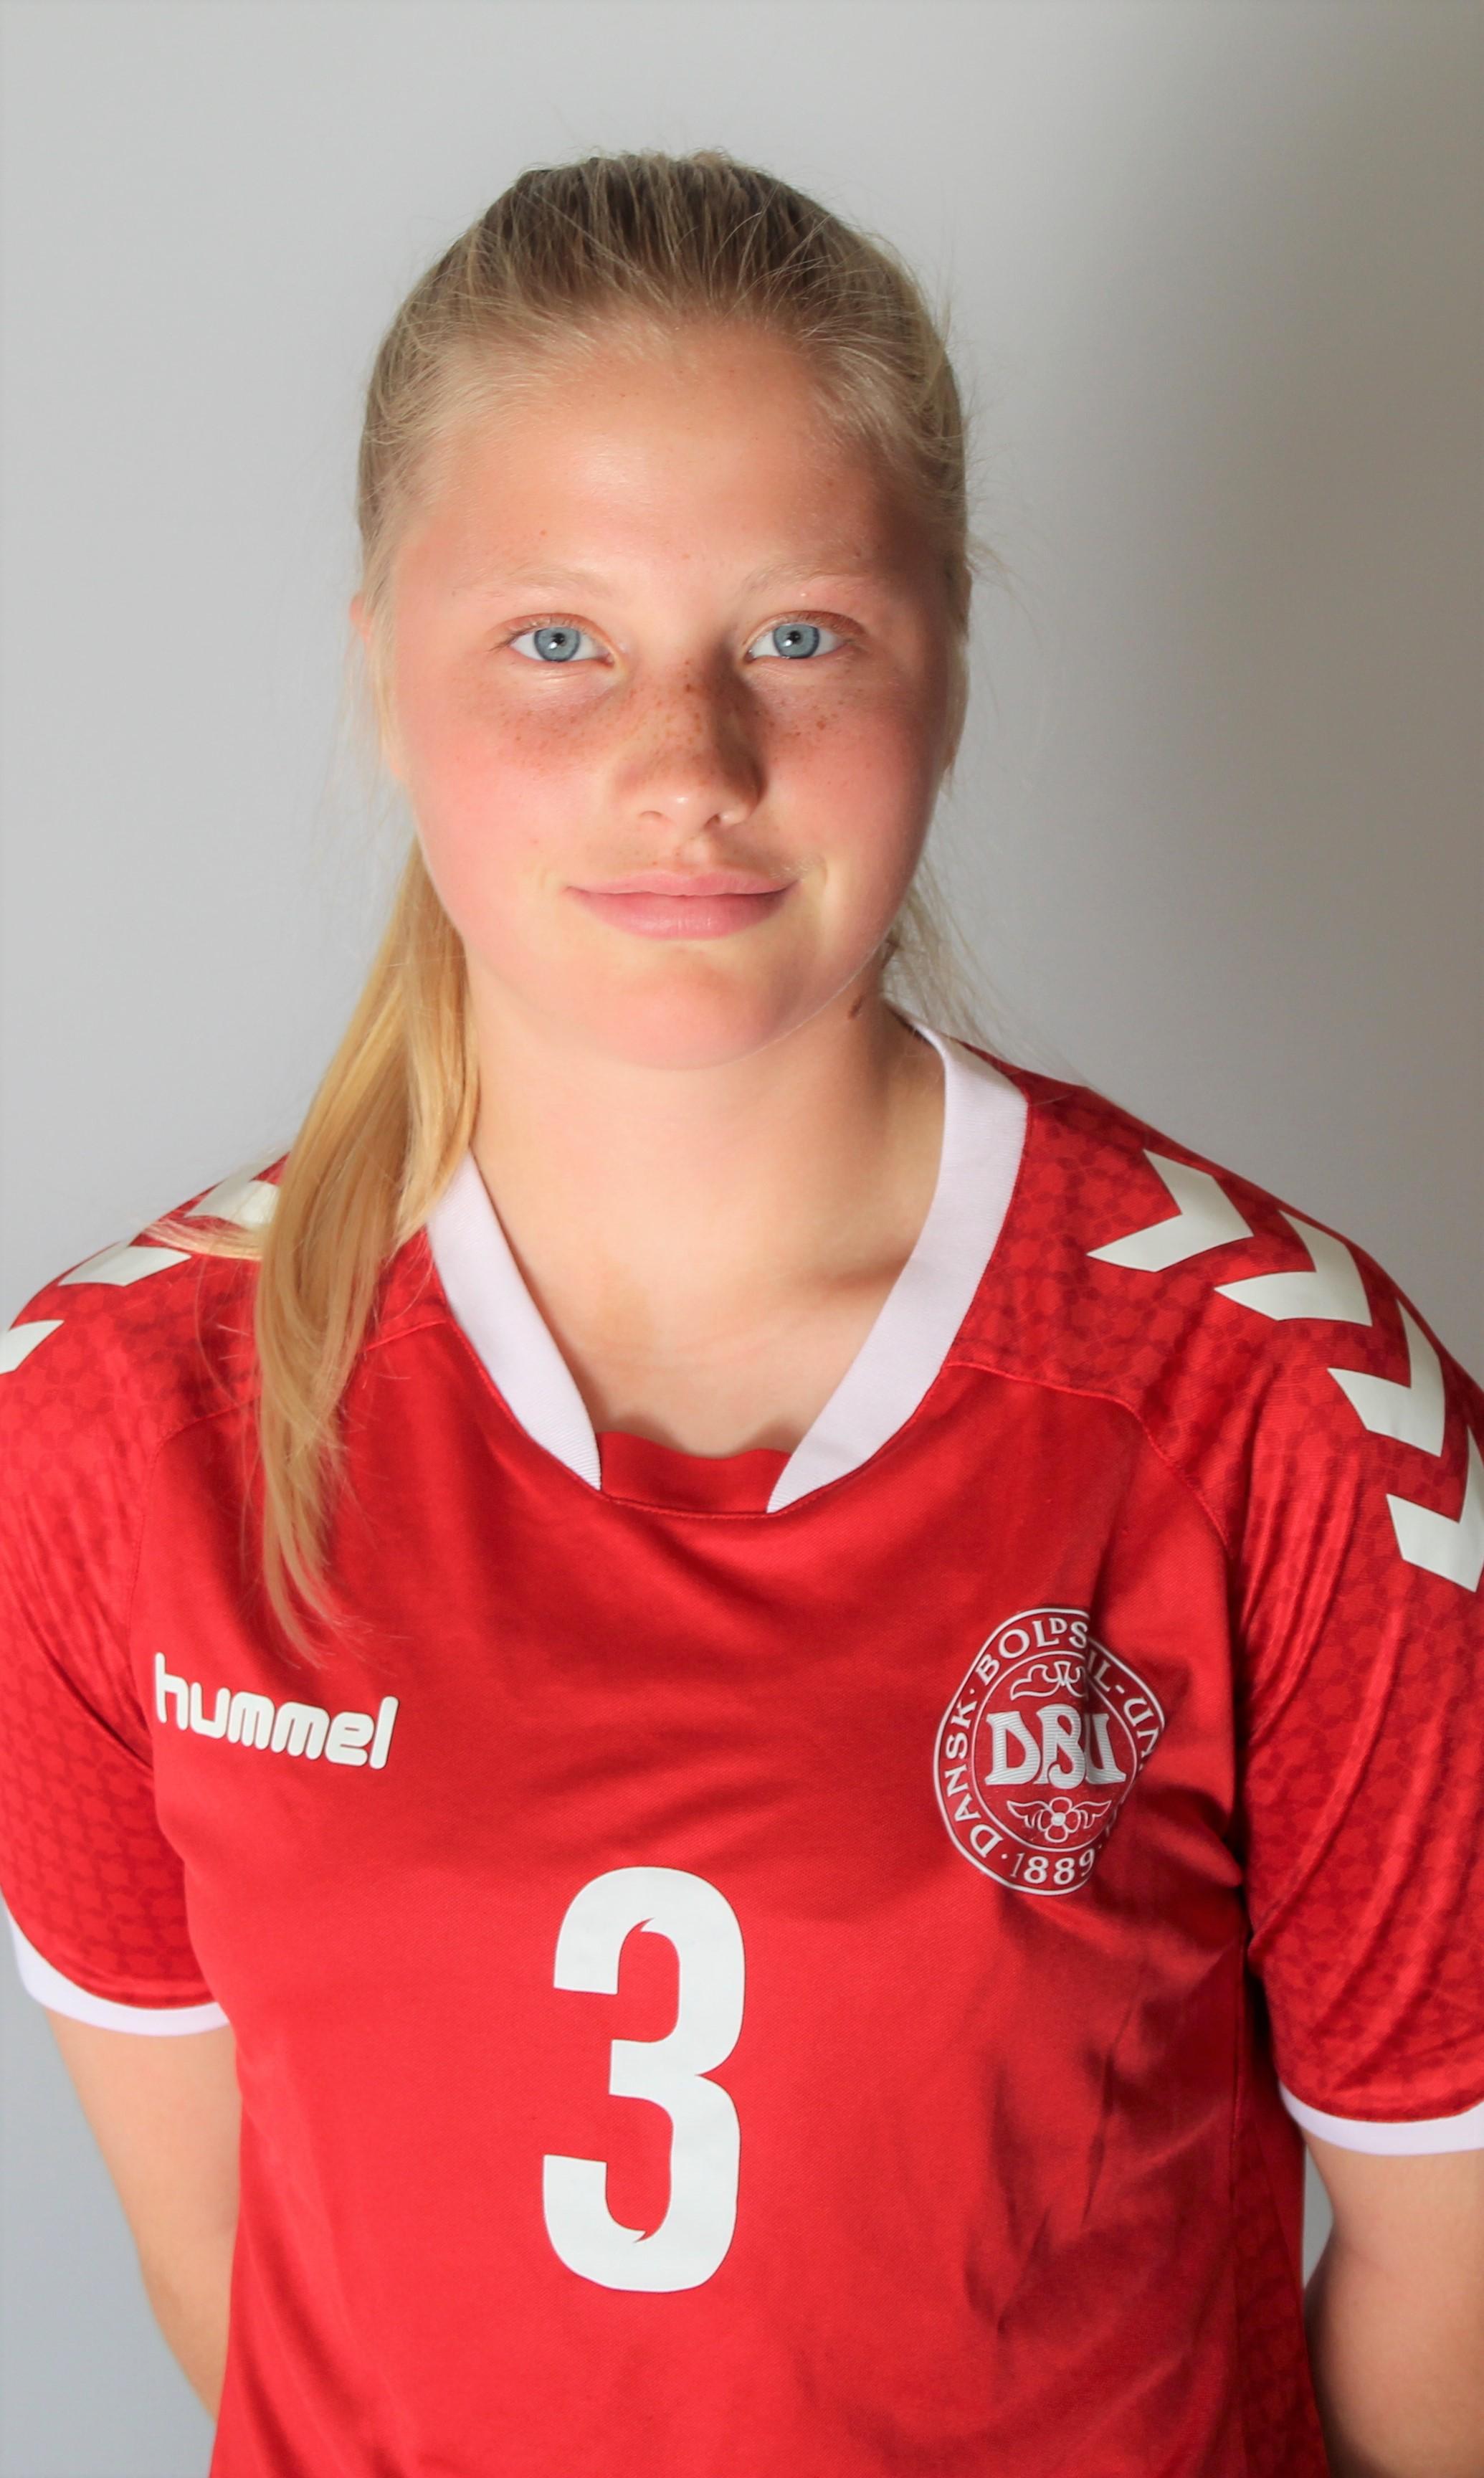 Frederikke Alma Lund Holmberg